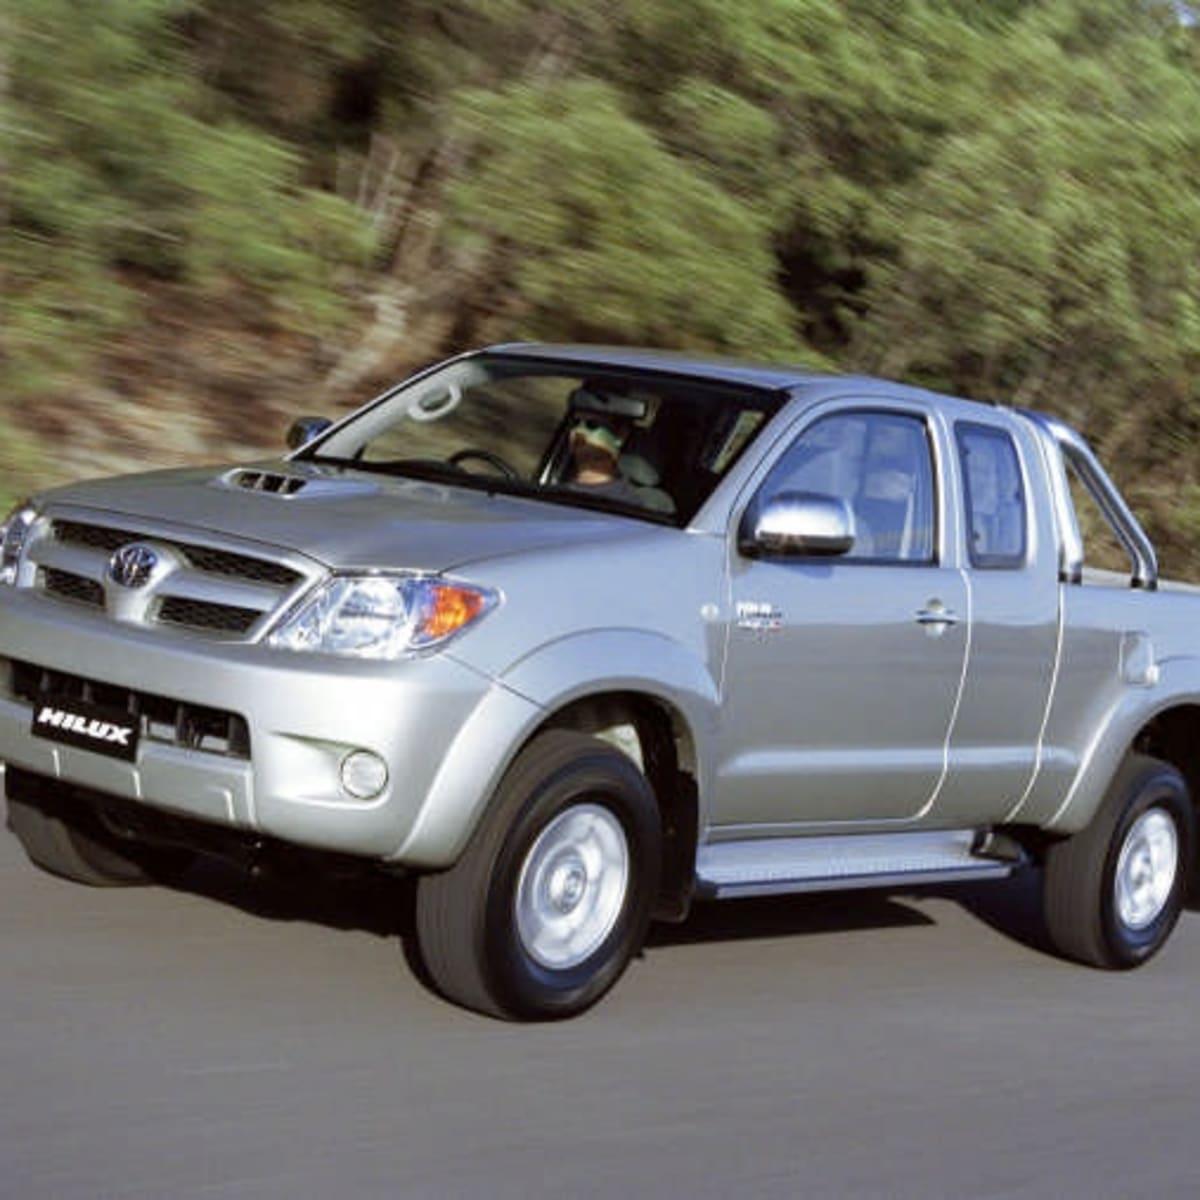 Kelebihan Toyota Hilux 2006 Harga